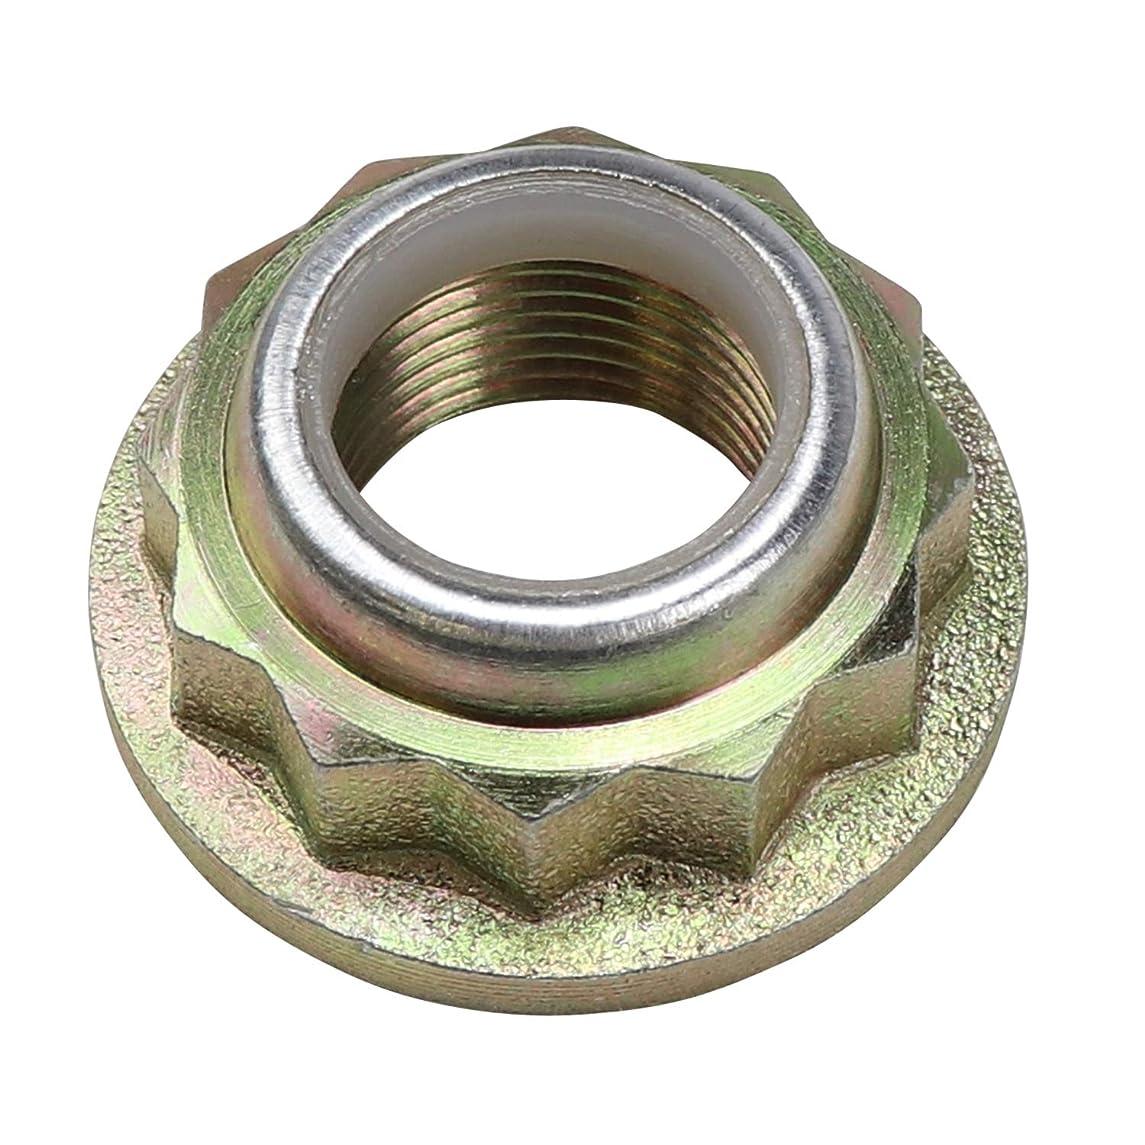 Beck Arnley 103-0534 Axle Nut